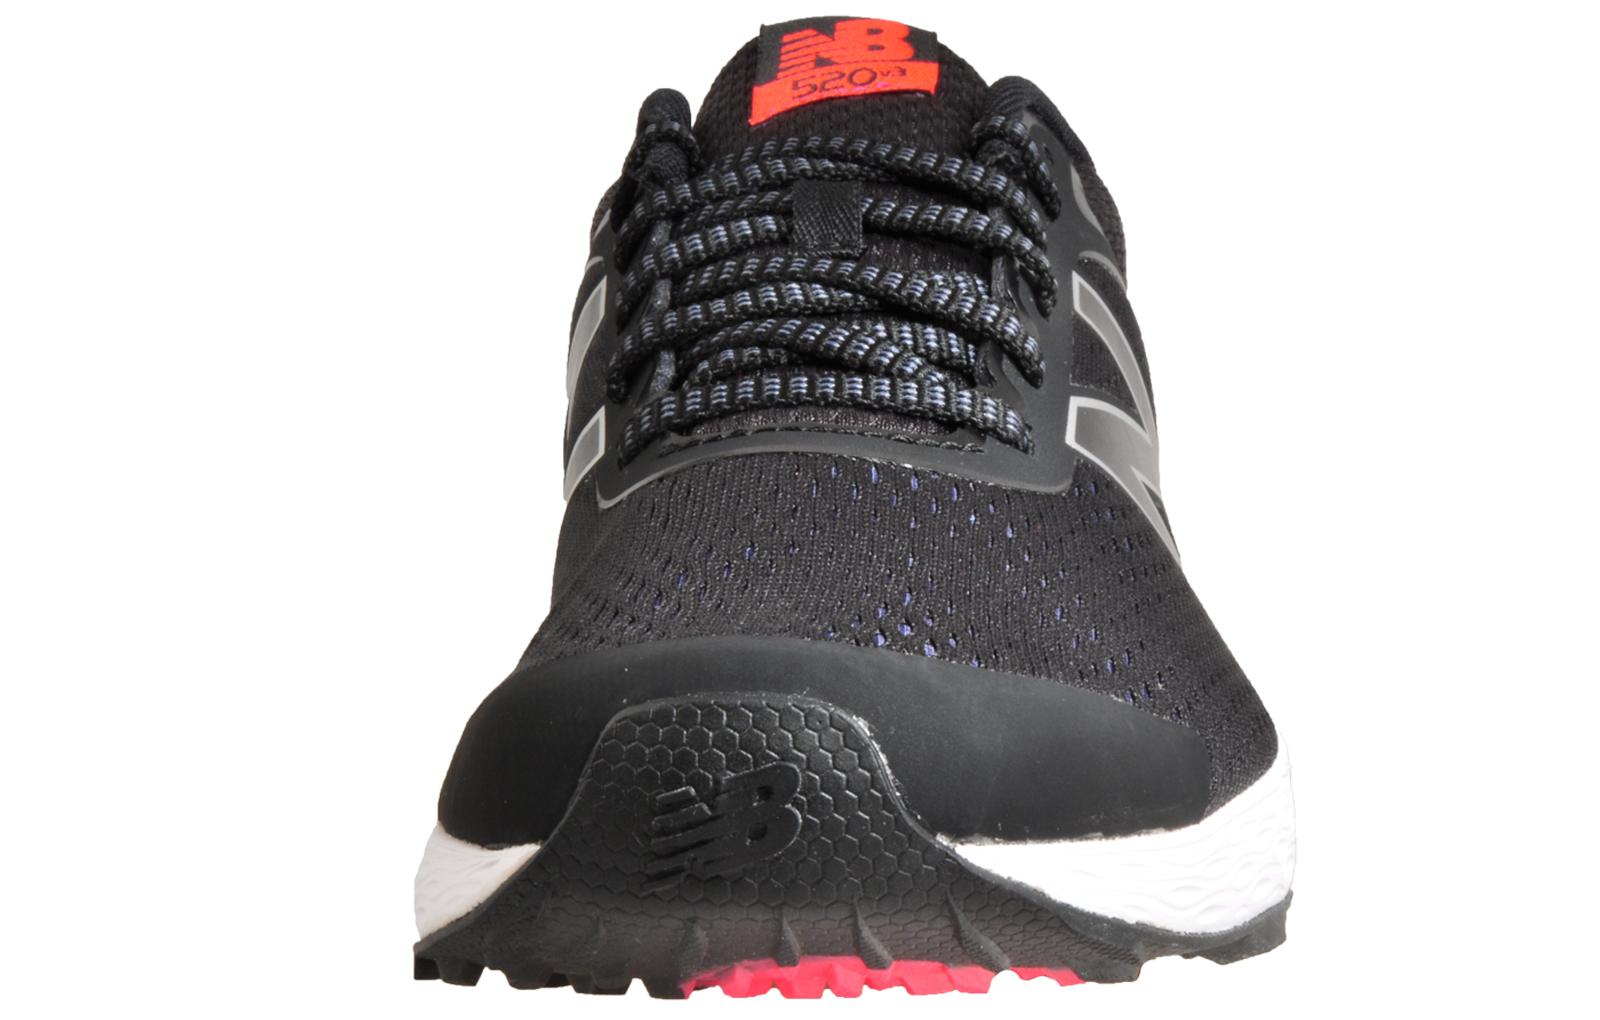 c35ed8bf8 New Balance 520 v3 Men s Performance Running Shoes Fitness Gym ...